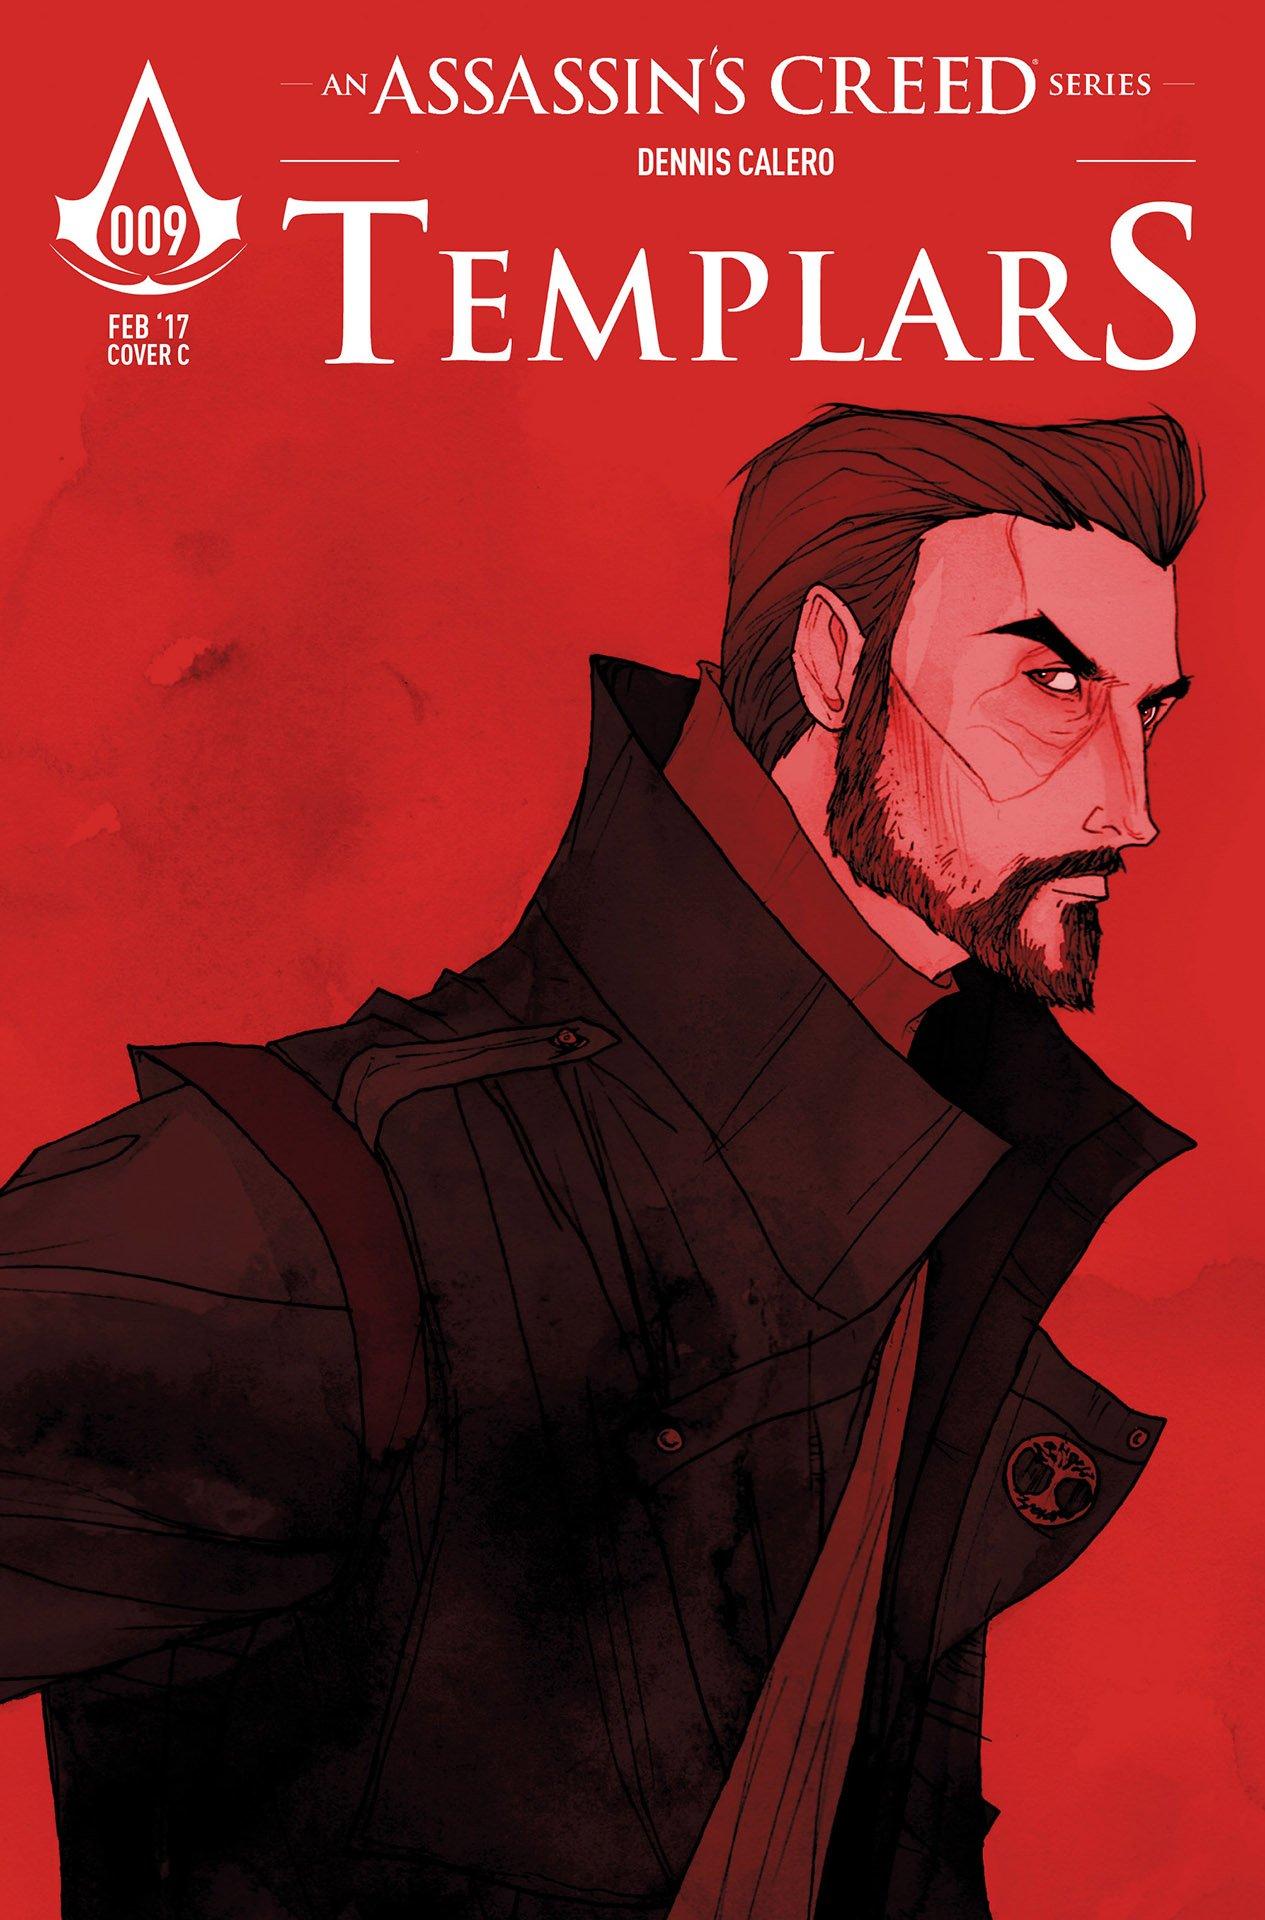 Assassin's Creed: Templars 09 (cover c) (February 2017)